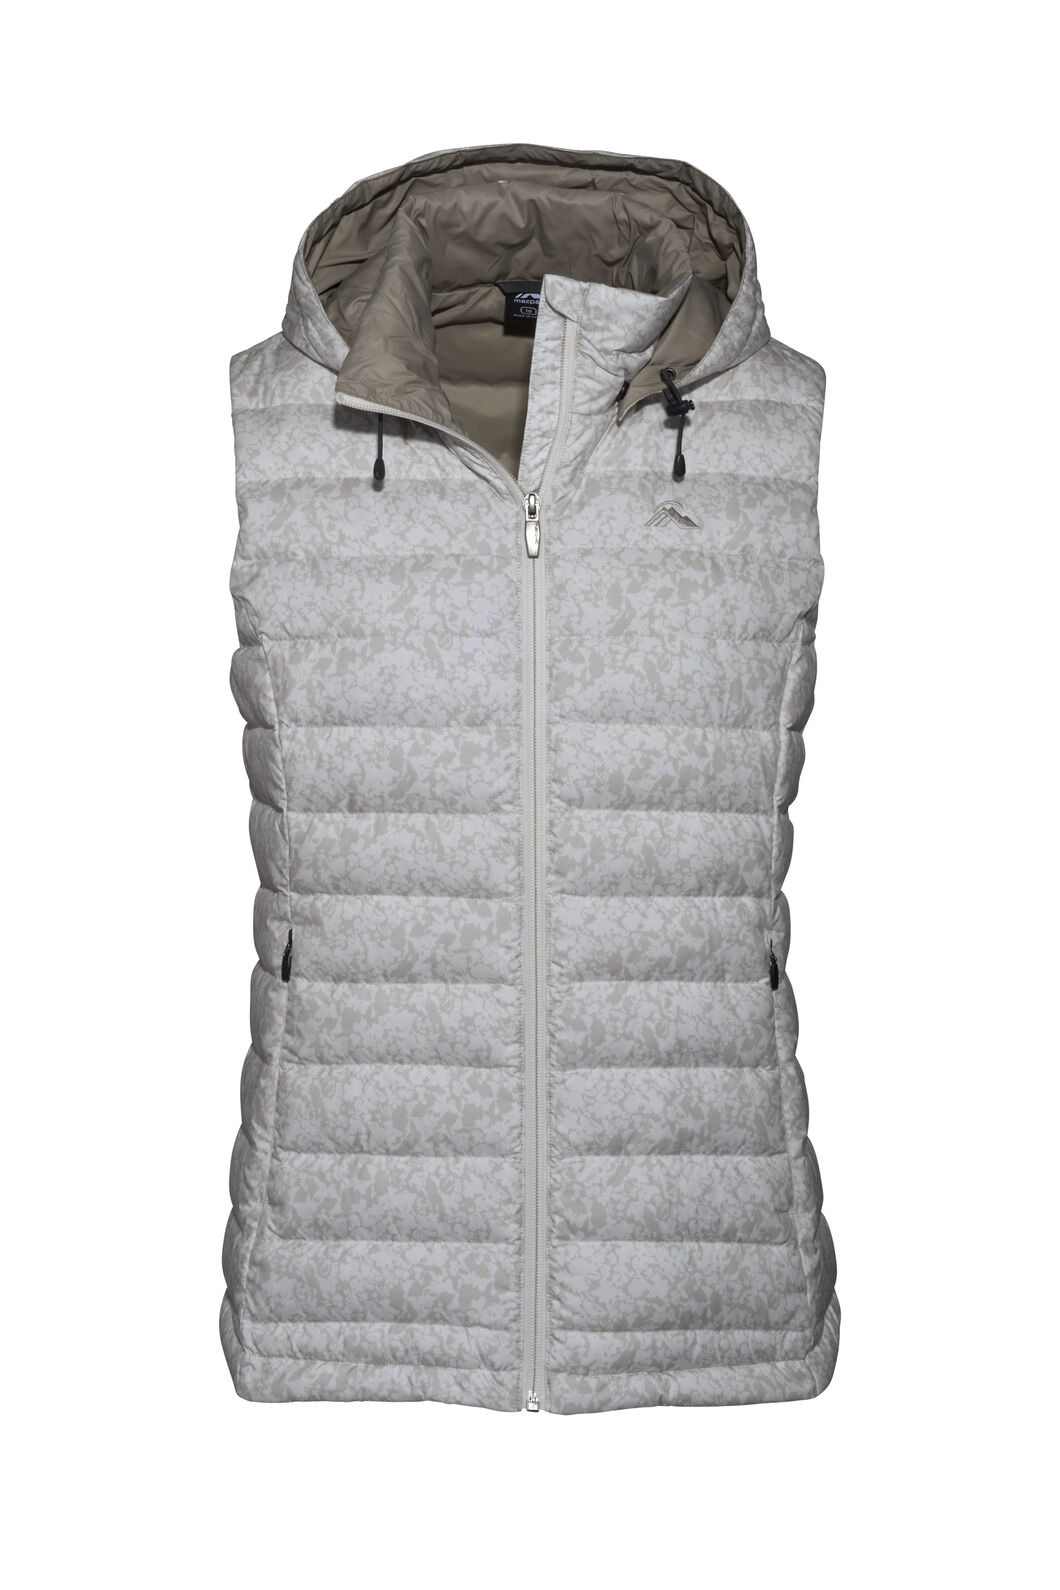 Macpac Zodiac Hooded Down Vest — Women's, Moonbeam, hi-res